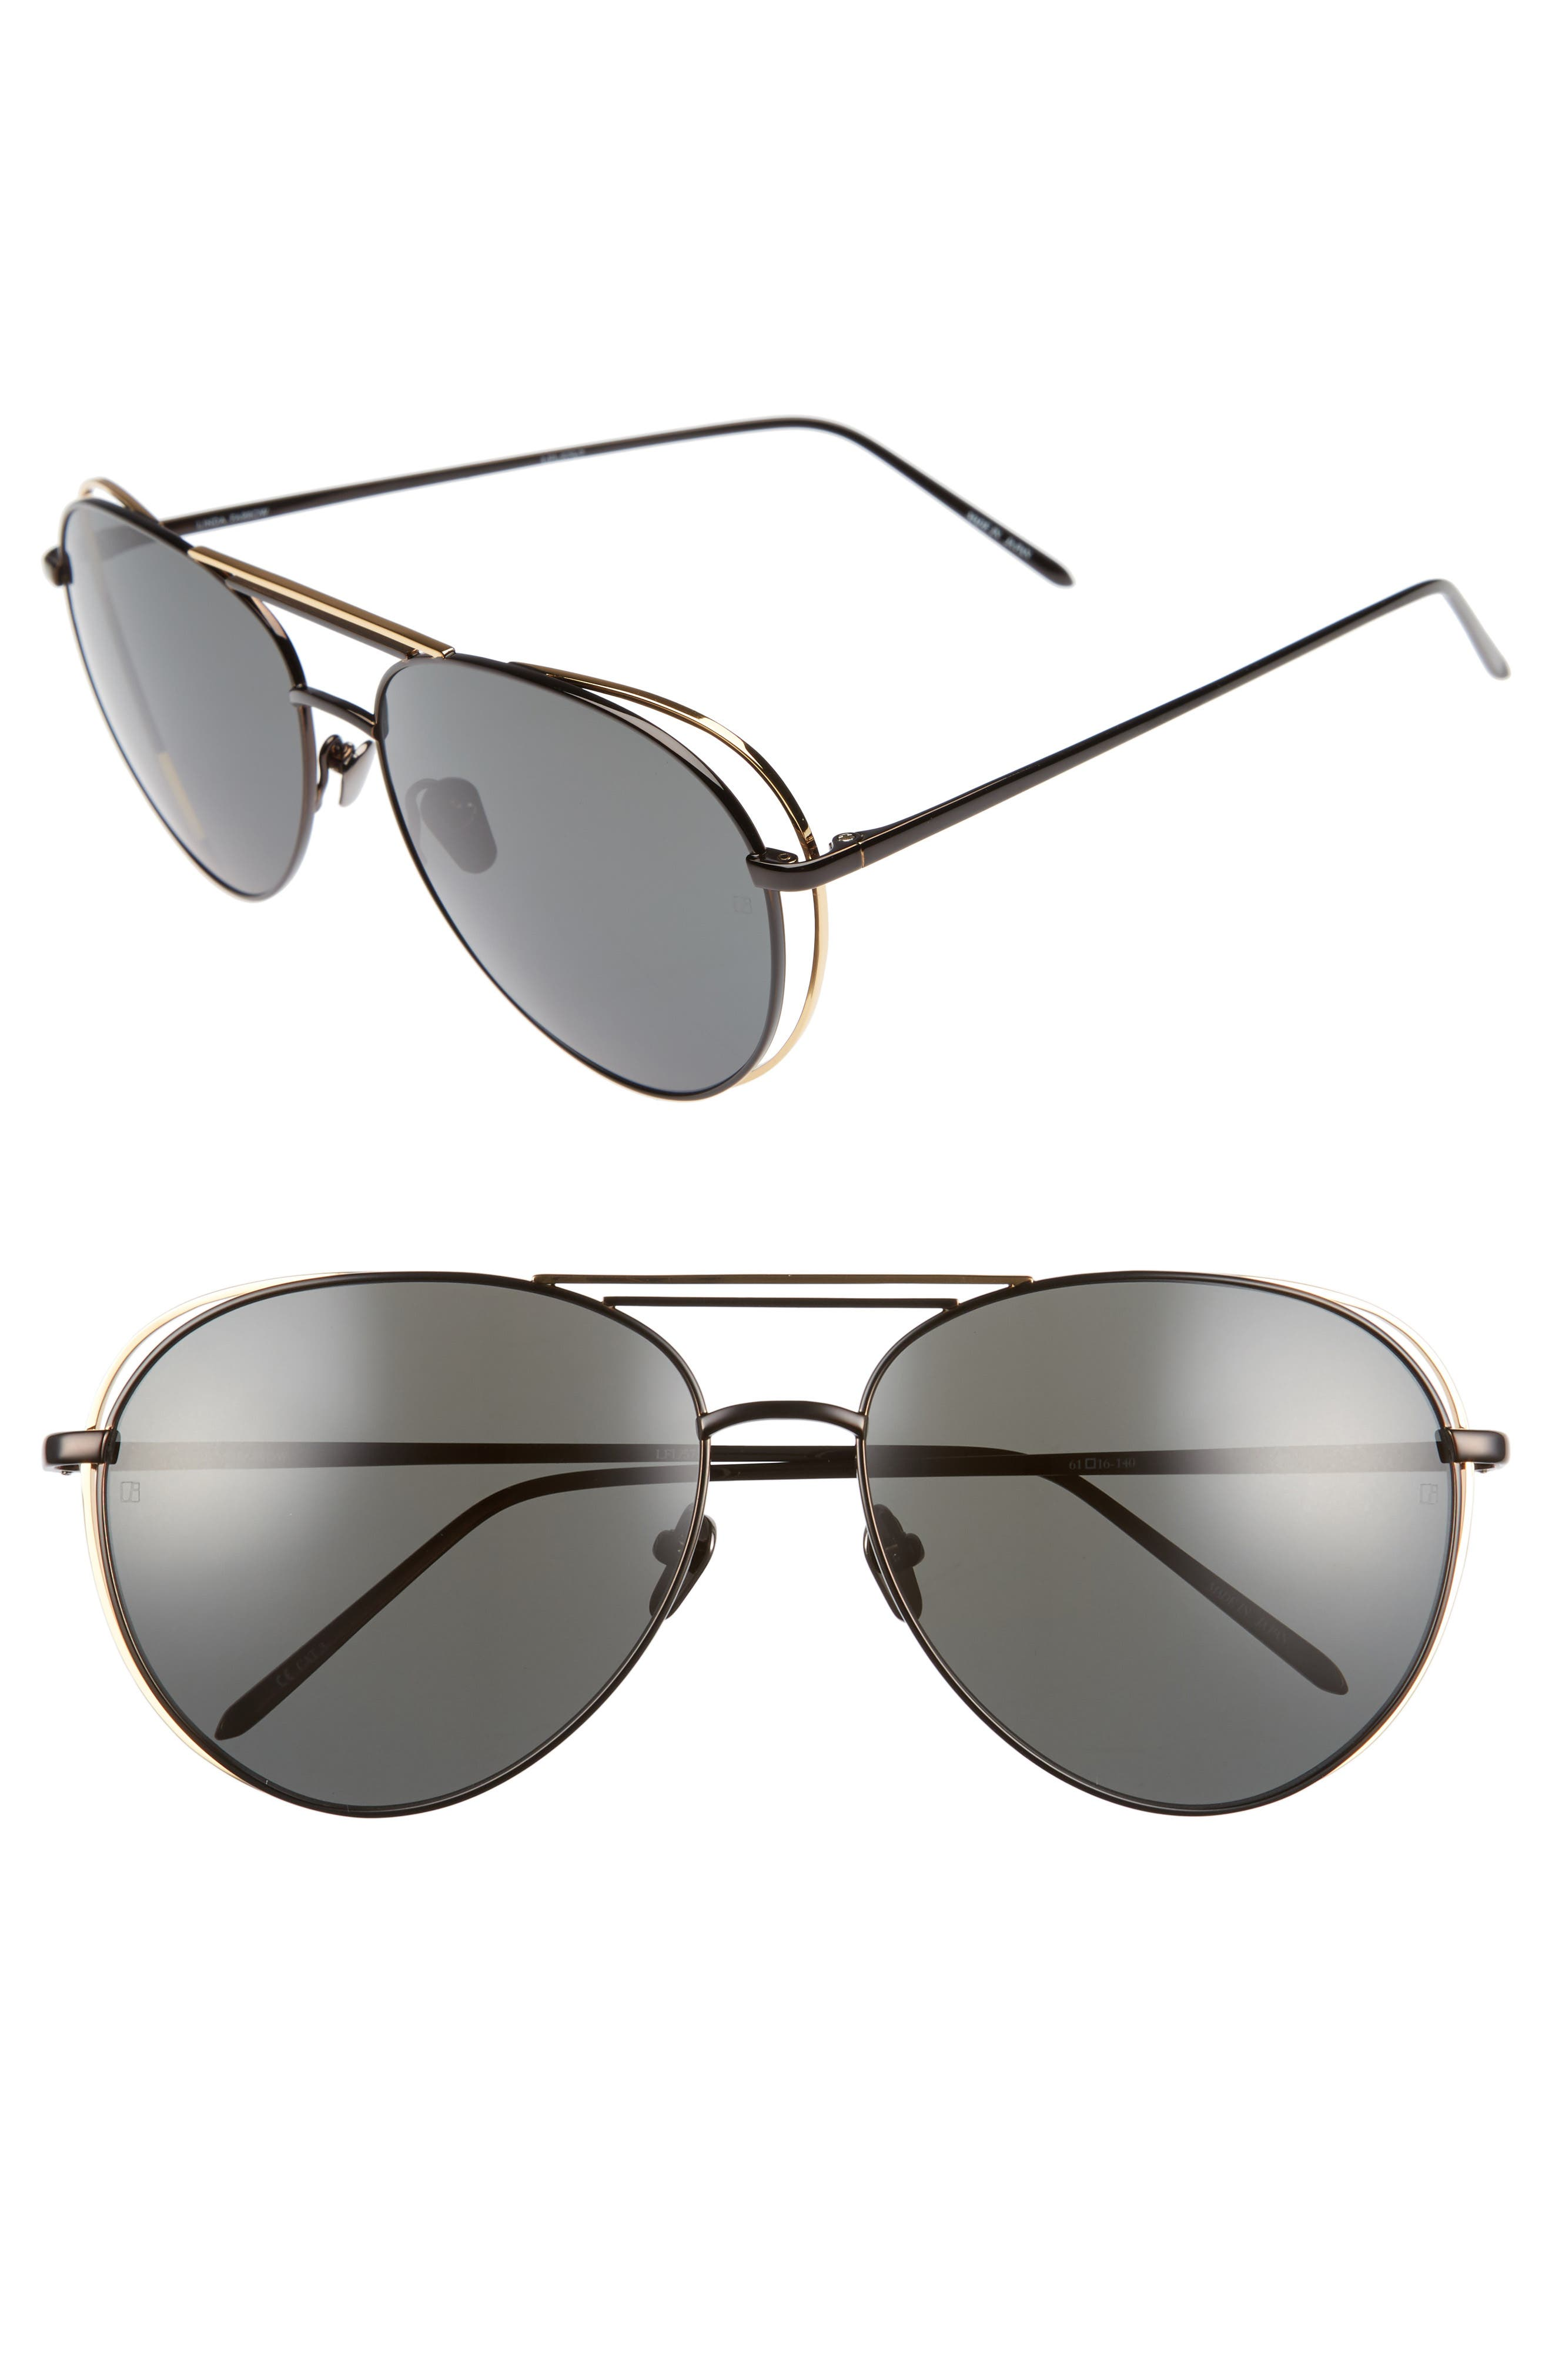 61mm 18 Karat Gold Aviator Sunglasses,                         Main,                         color,